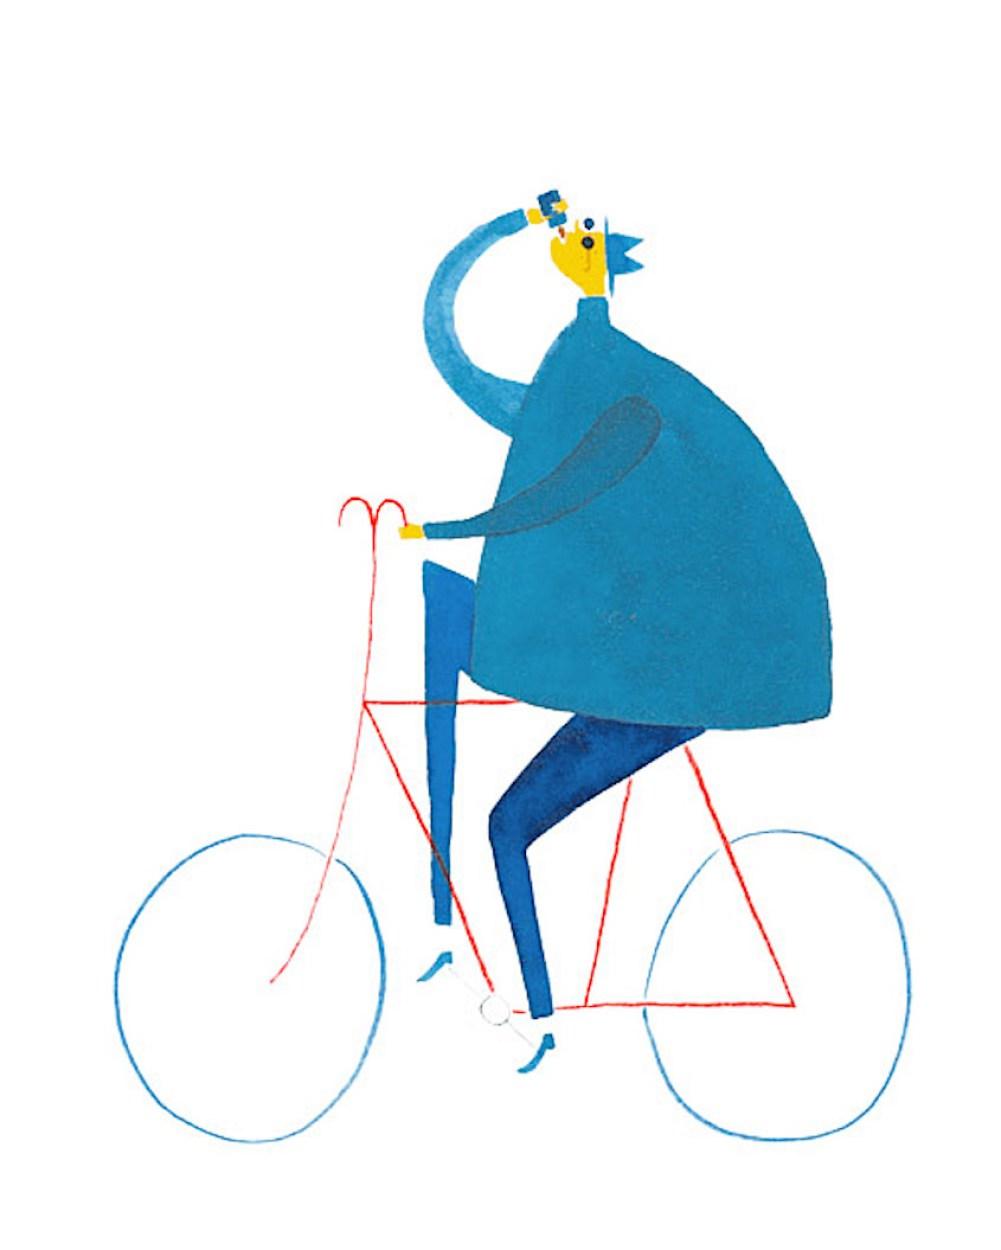 daniel-frost-illustrations_urbancycling_6